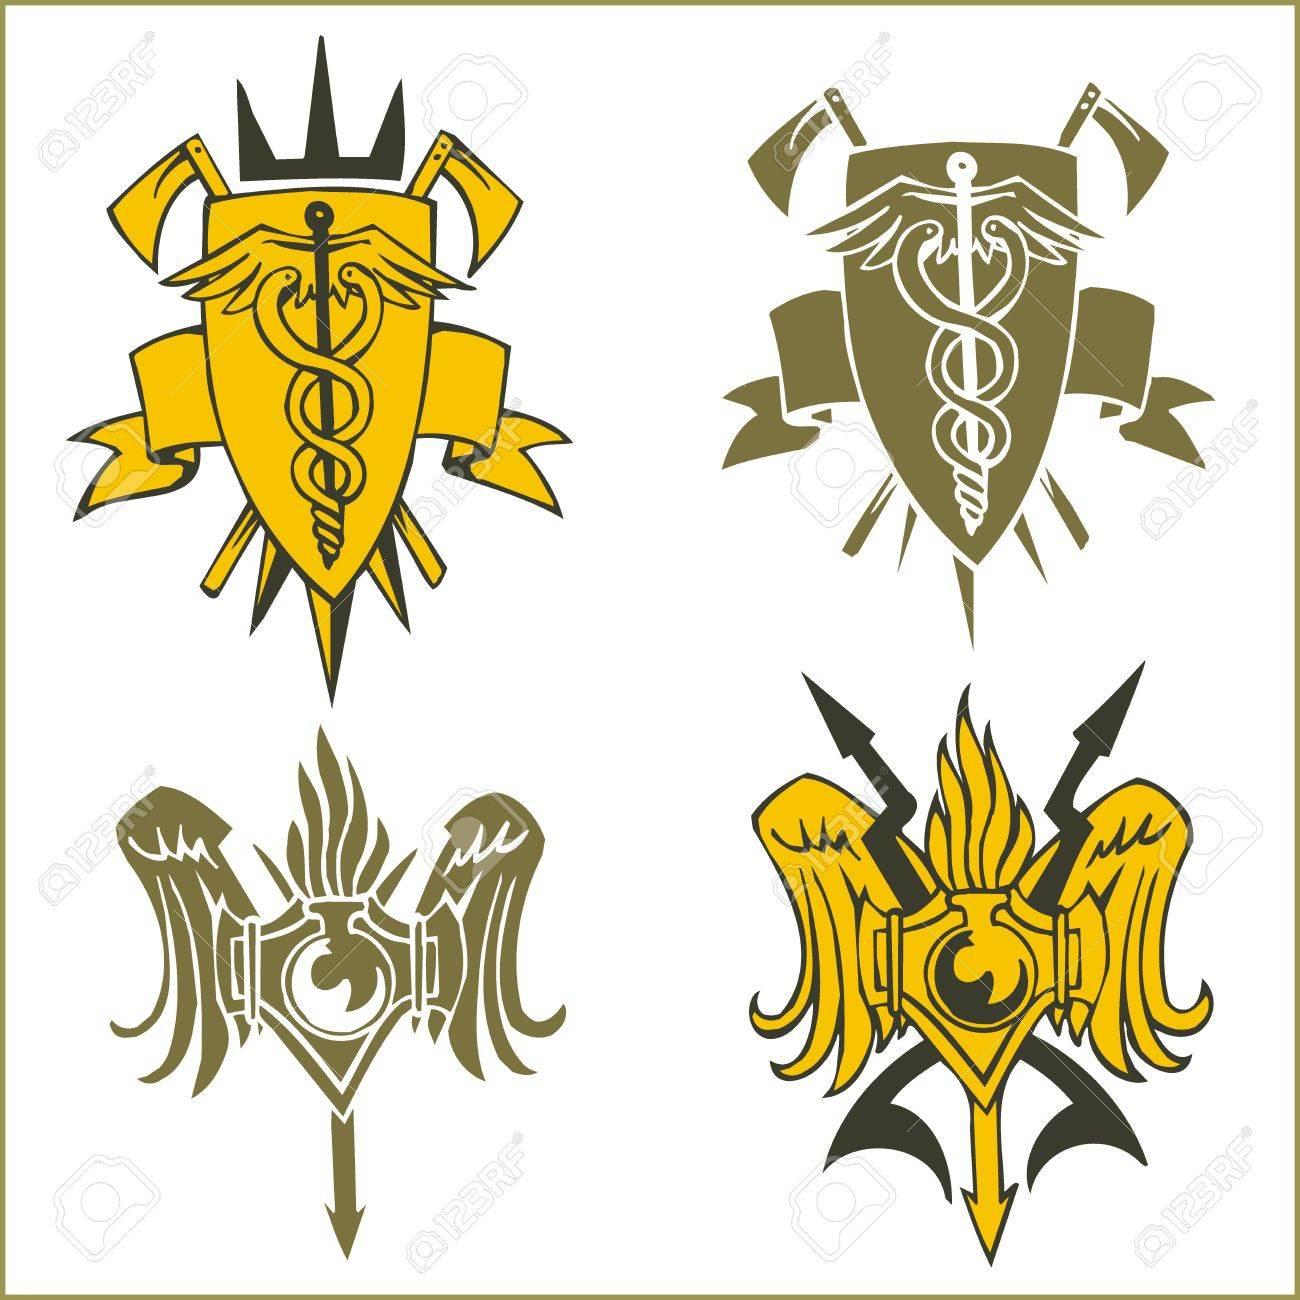 Military Emblem Stock Vector - 16719409